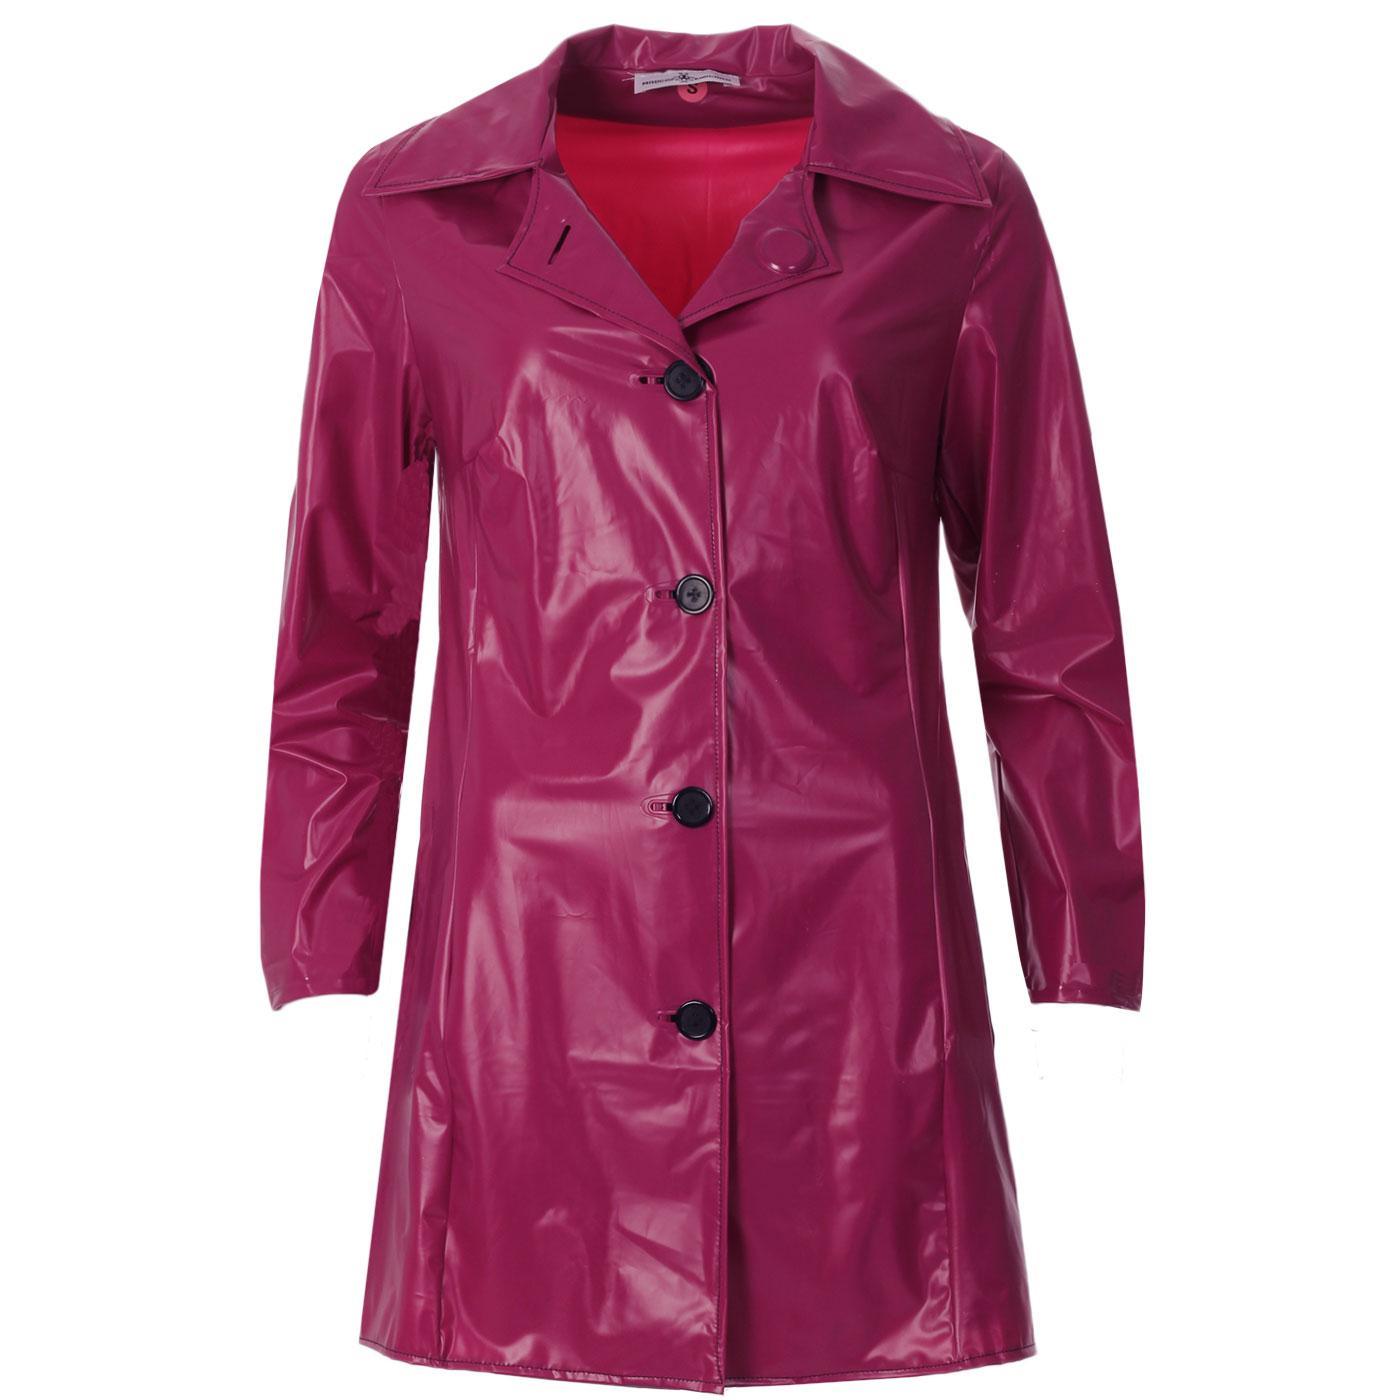 Madcap England Jackie Women's 1960s Mod PVC Raincoat in Maroon Pearl